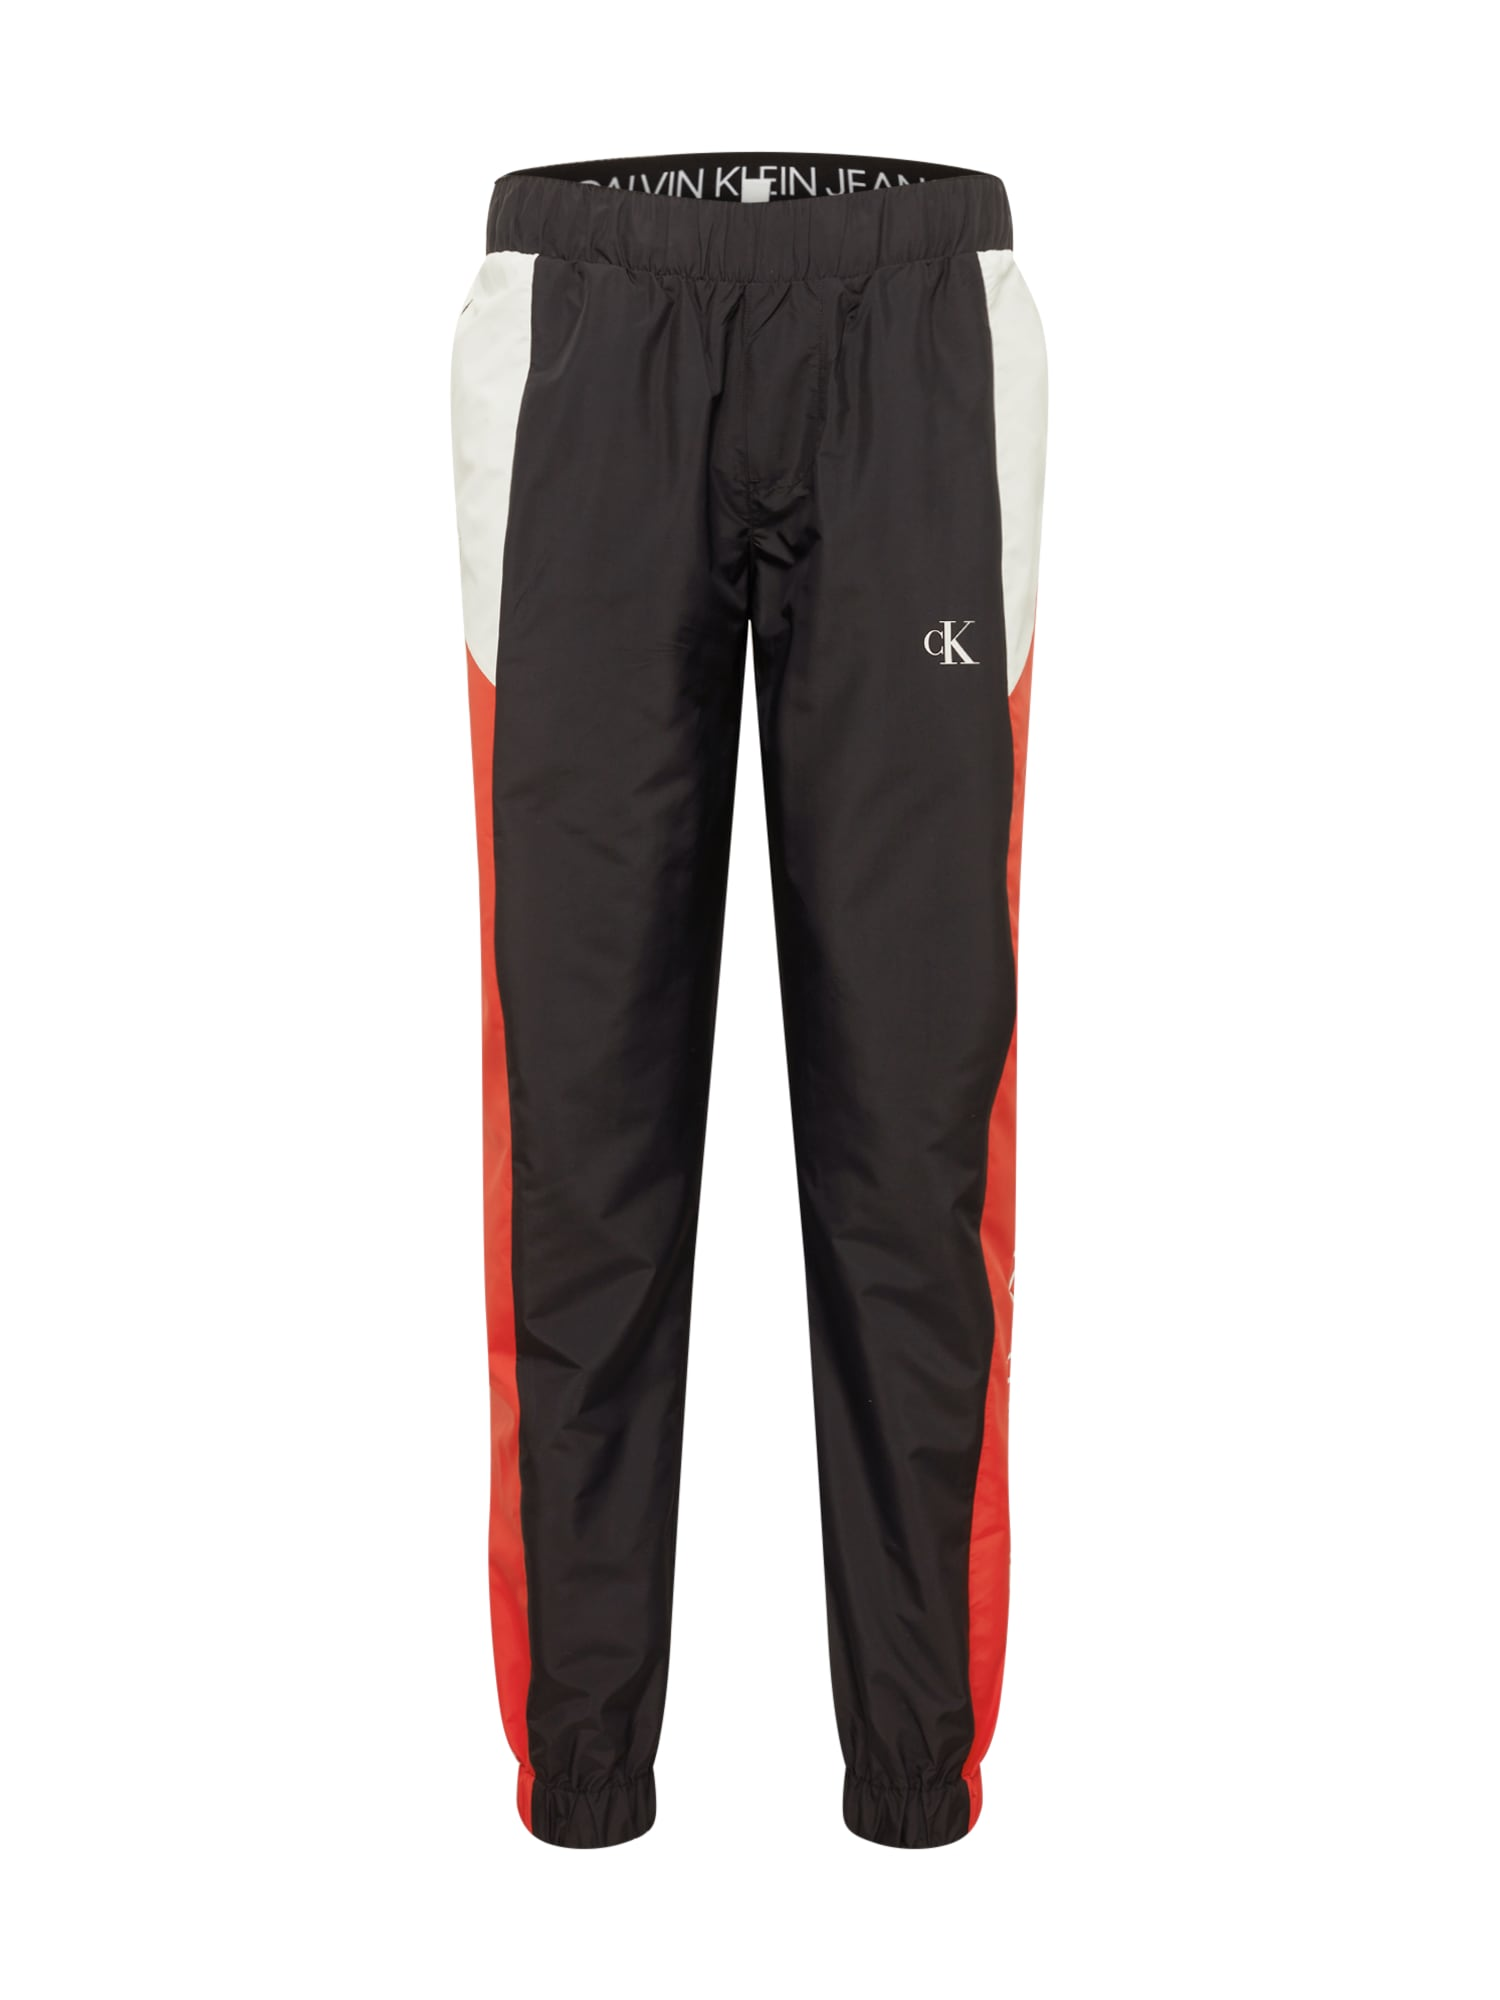 Calvin Klein Jeans Kelnės juoda / balta / raudona